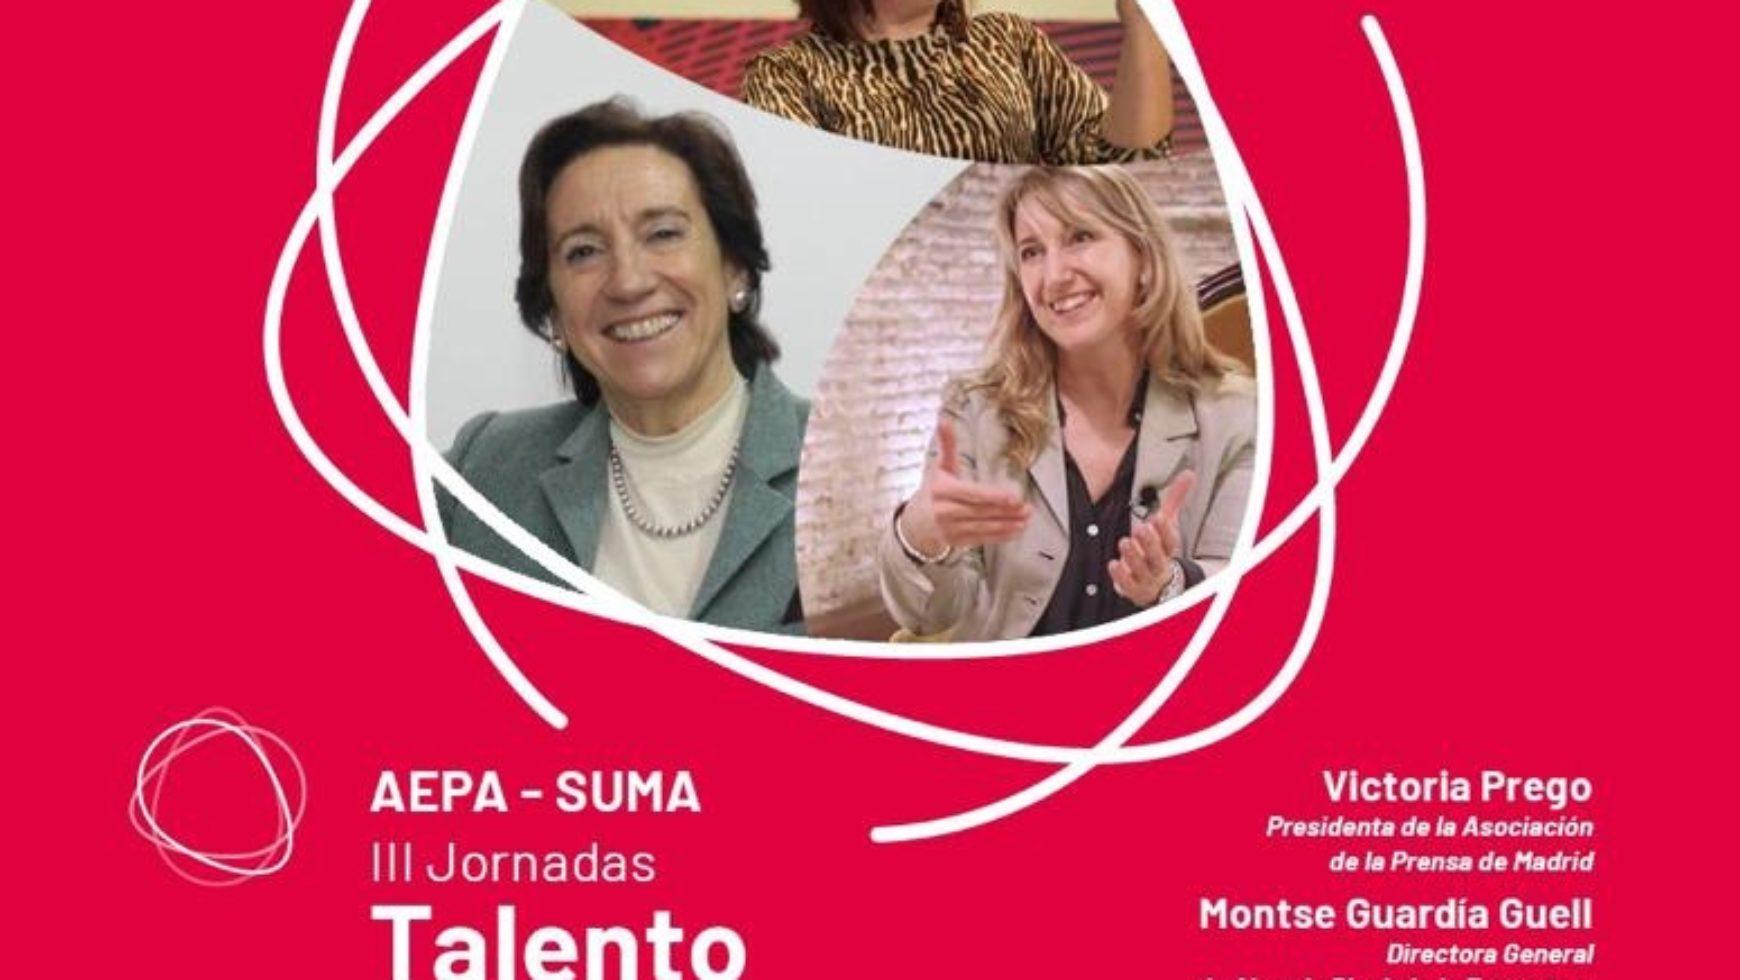 III Jornadas Talento Femenino AEPA-SUMA.